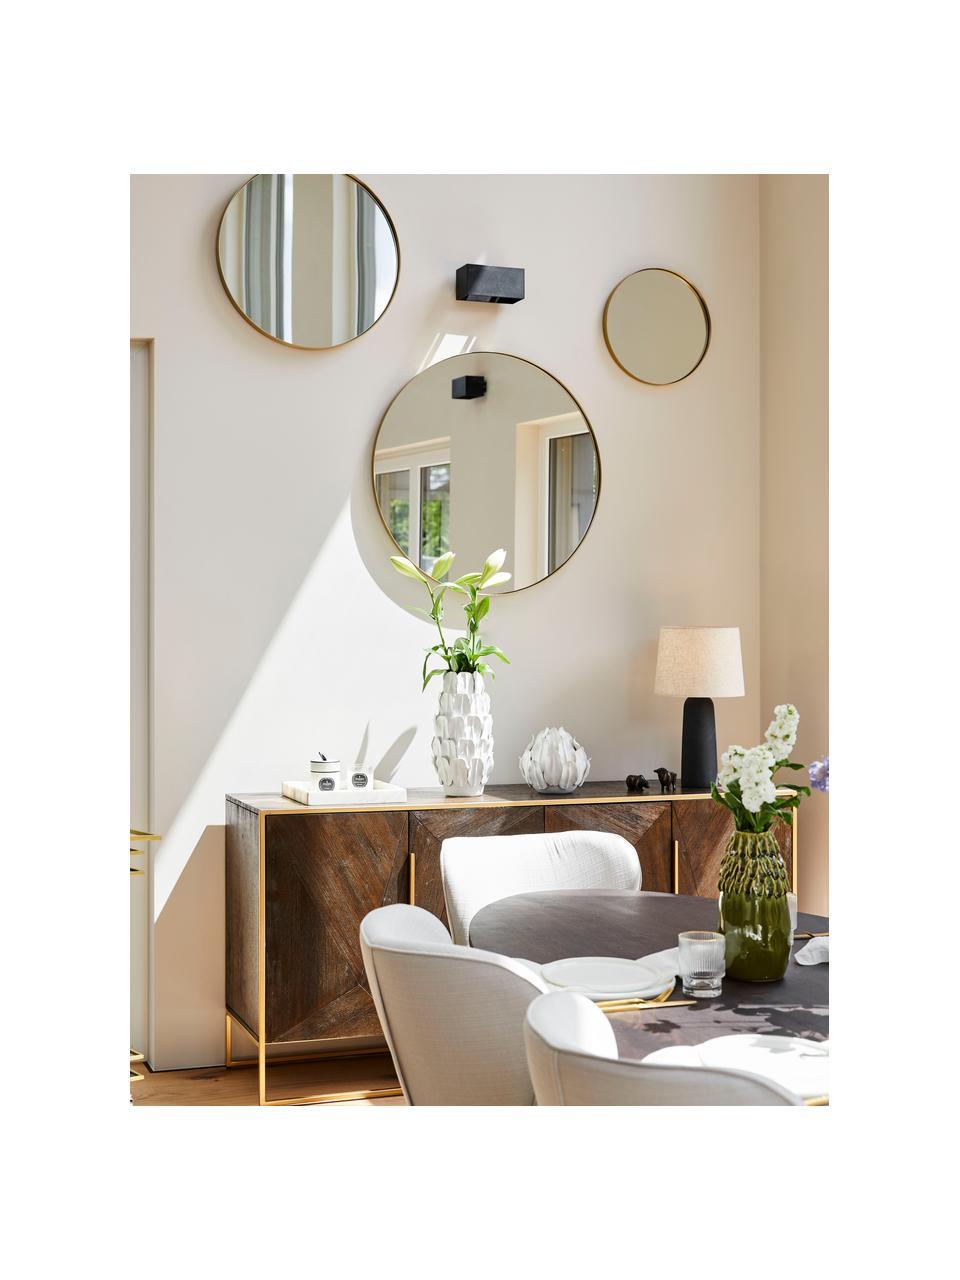 Sada nástěnných zrcadel Ivy, Kartáčovaná mosazná